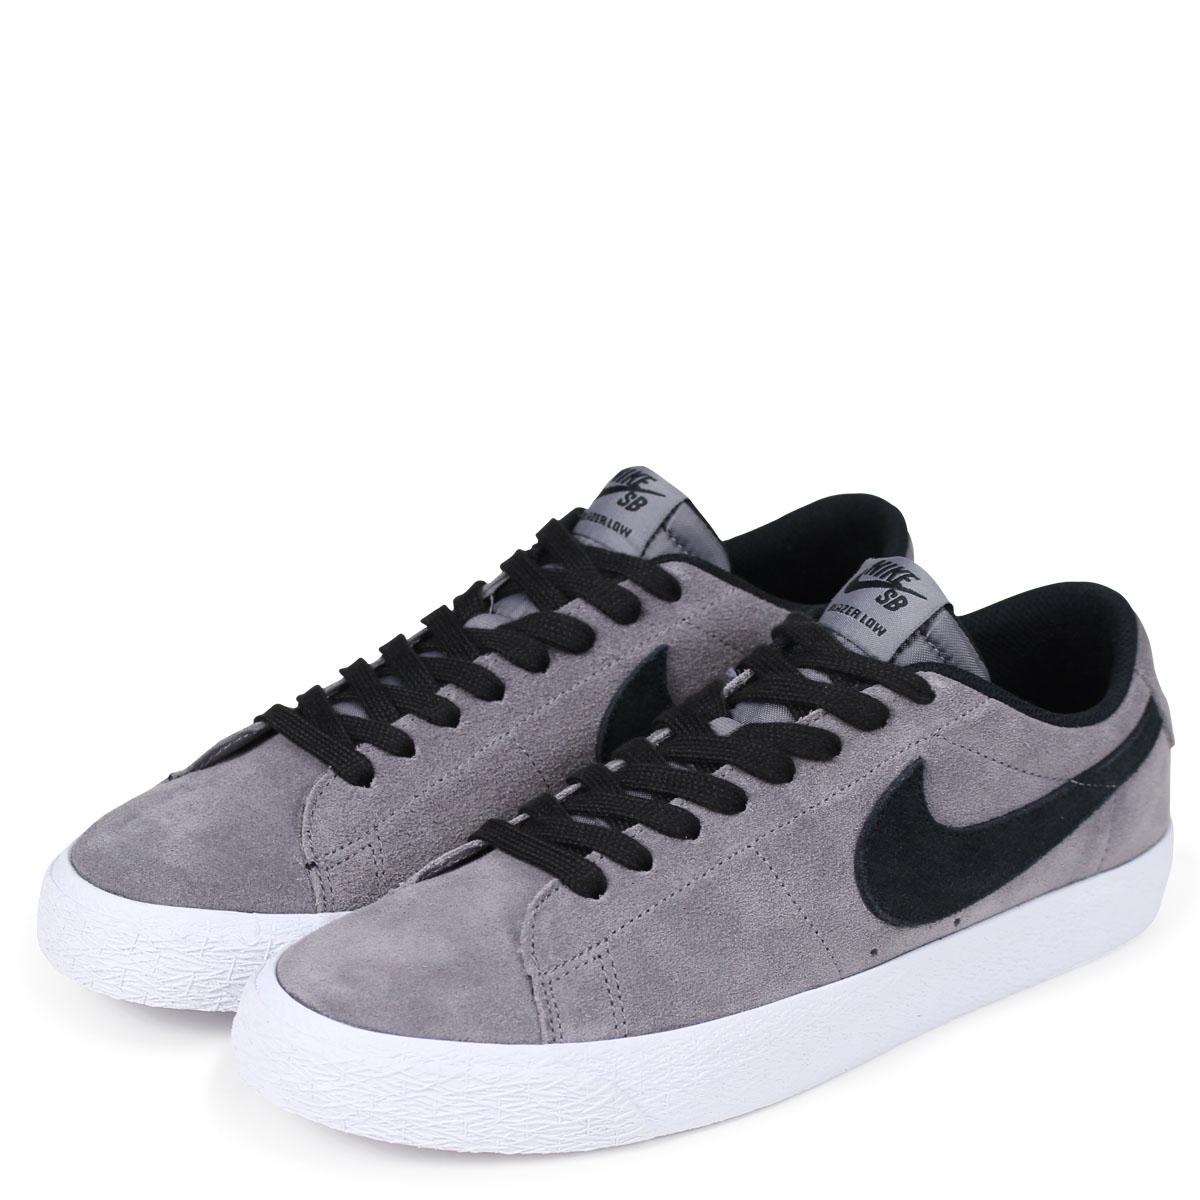 innovative design d25f4 224b7 NIKE BLEAZER LOW Nike SB blazer low sneakers men 864,347-003 black [4/13  Shinnyu load] [184]